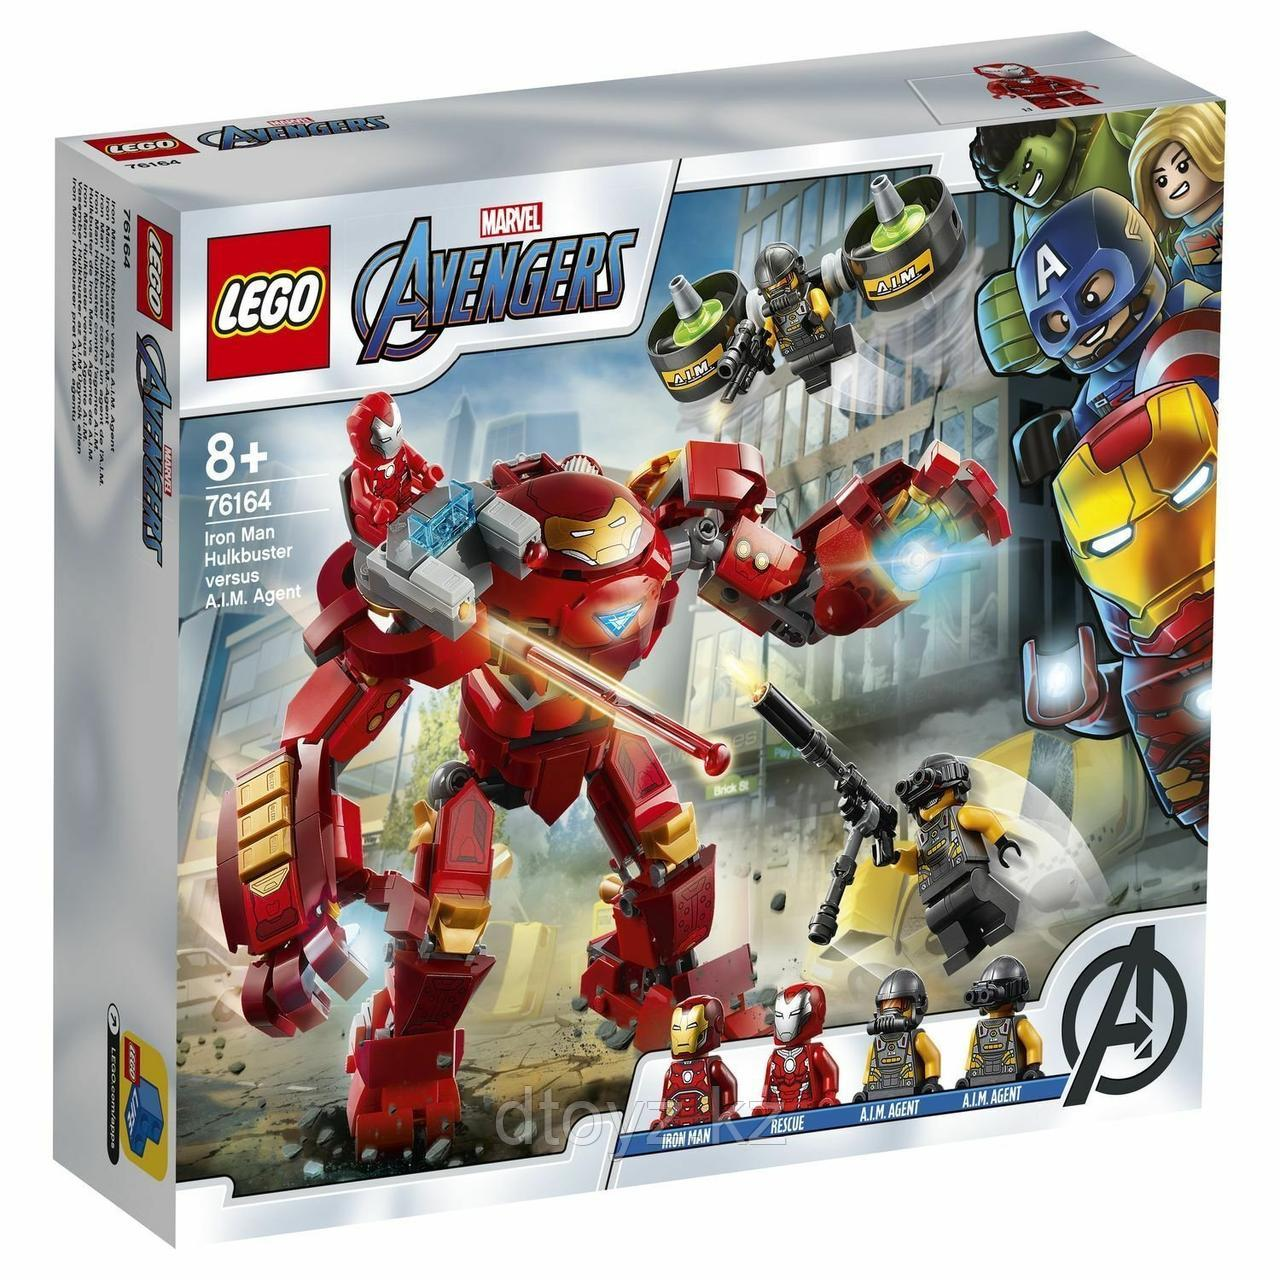 Lego 76164 Marvel Super Heroes Халкбастер против агента А.И.М.